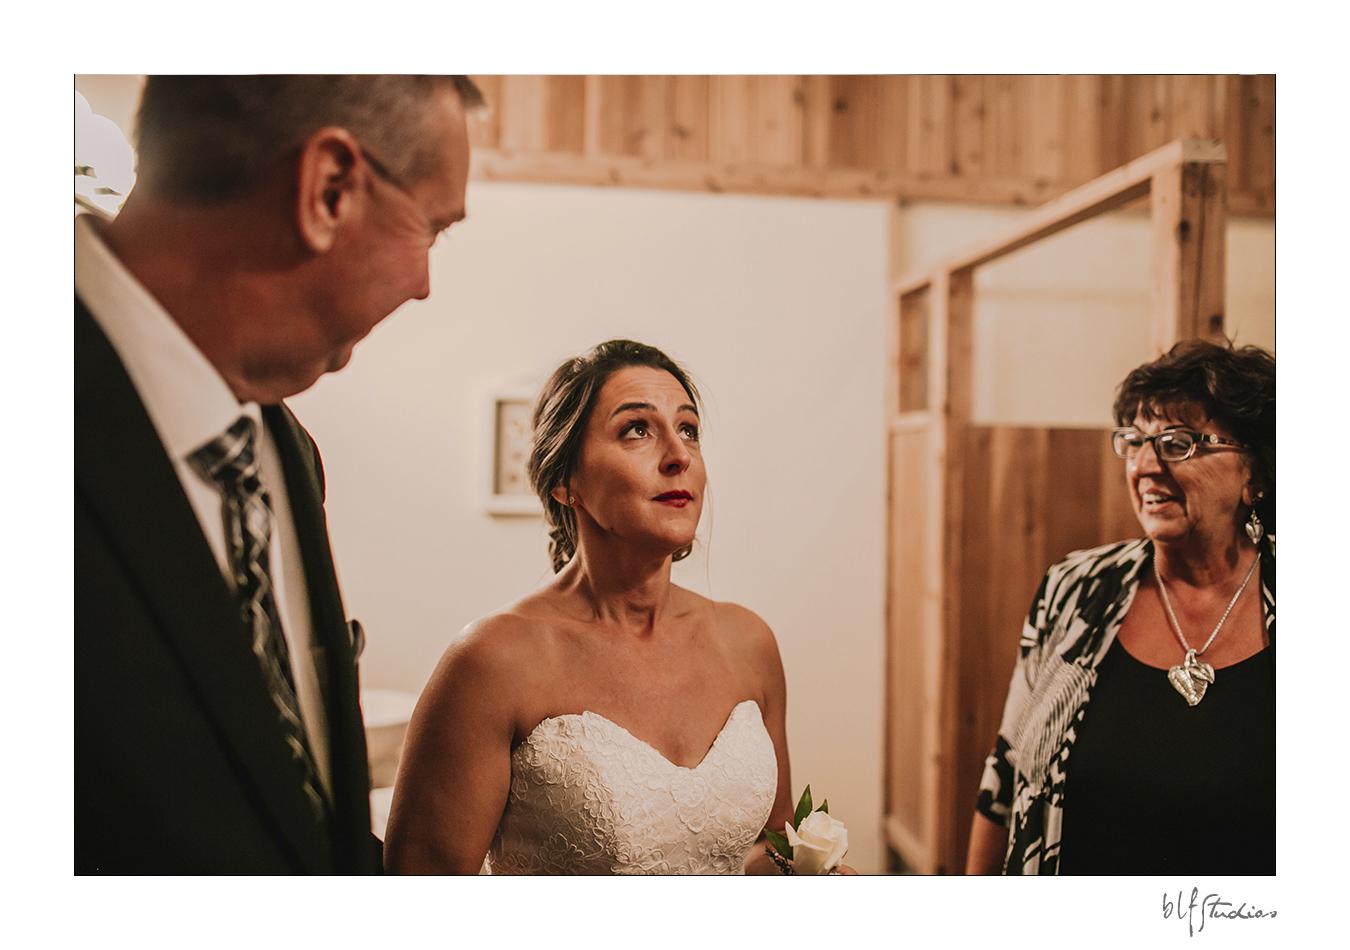 009-winnipeg-hitchnpost-wedding-marla-alana.jpg